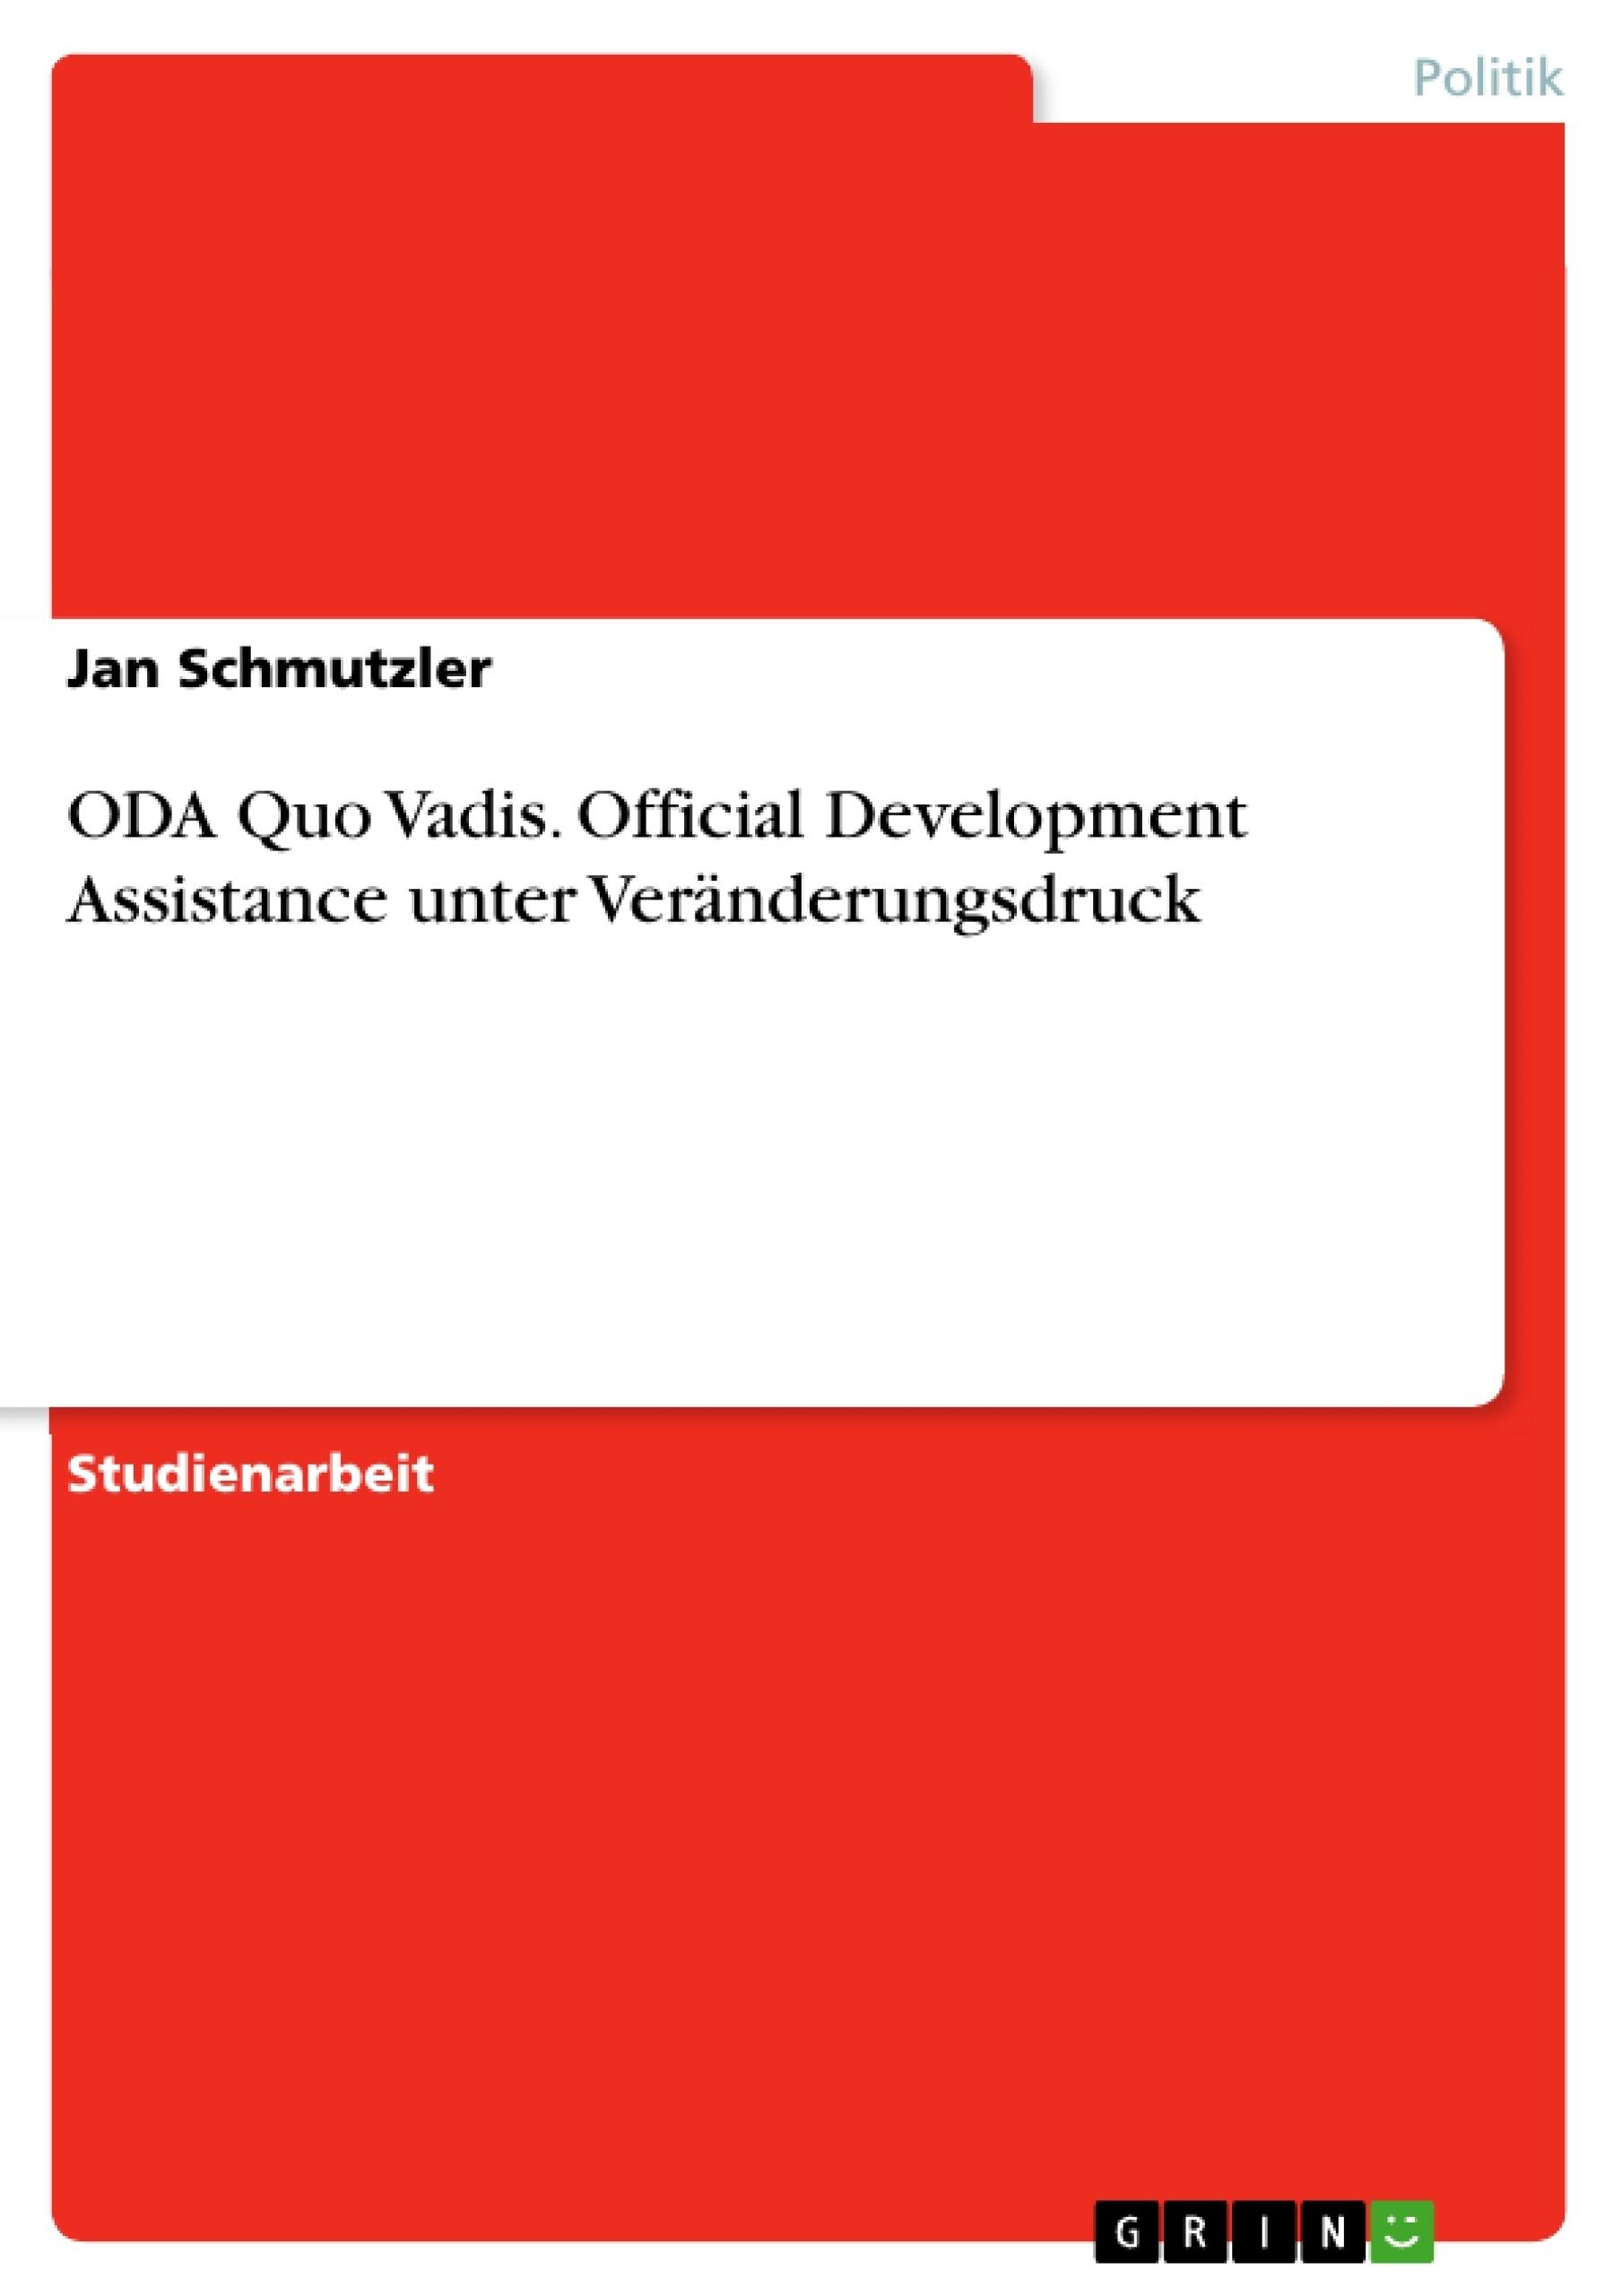 Titel: ODA Quo Vadis. Official Development Assistance unter Veränderungsdruck